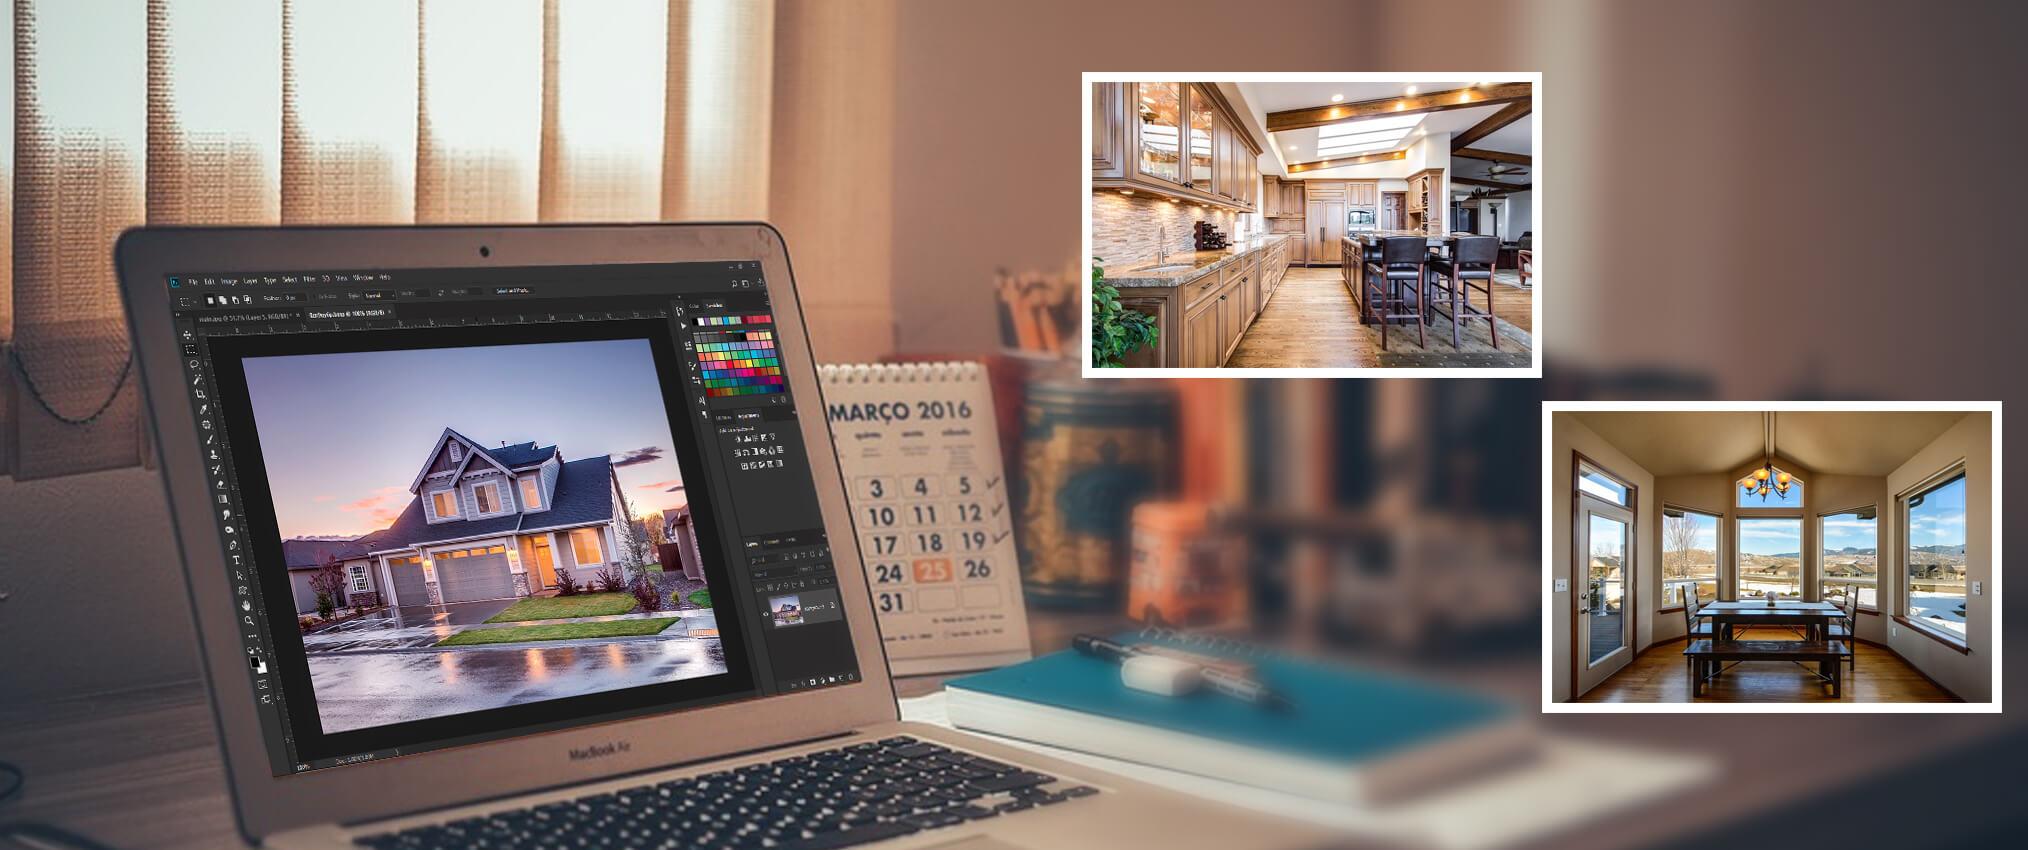 real estate photo editing